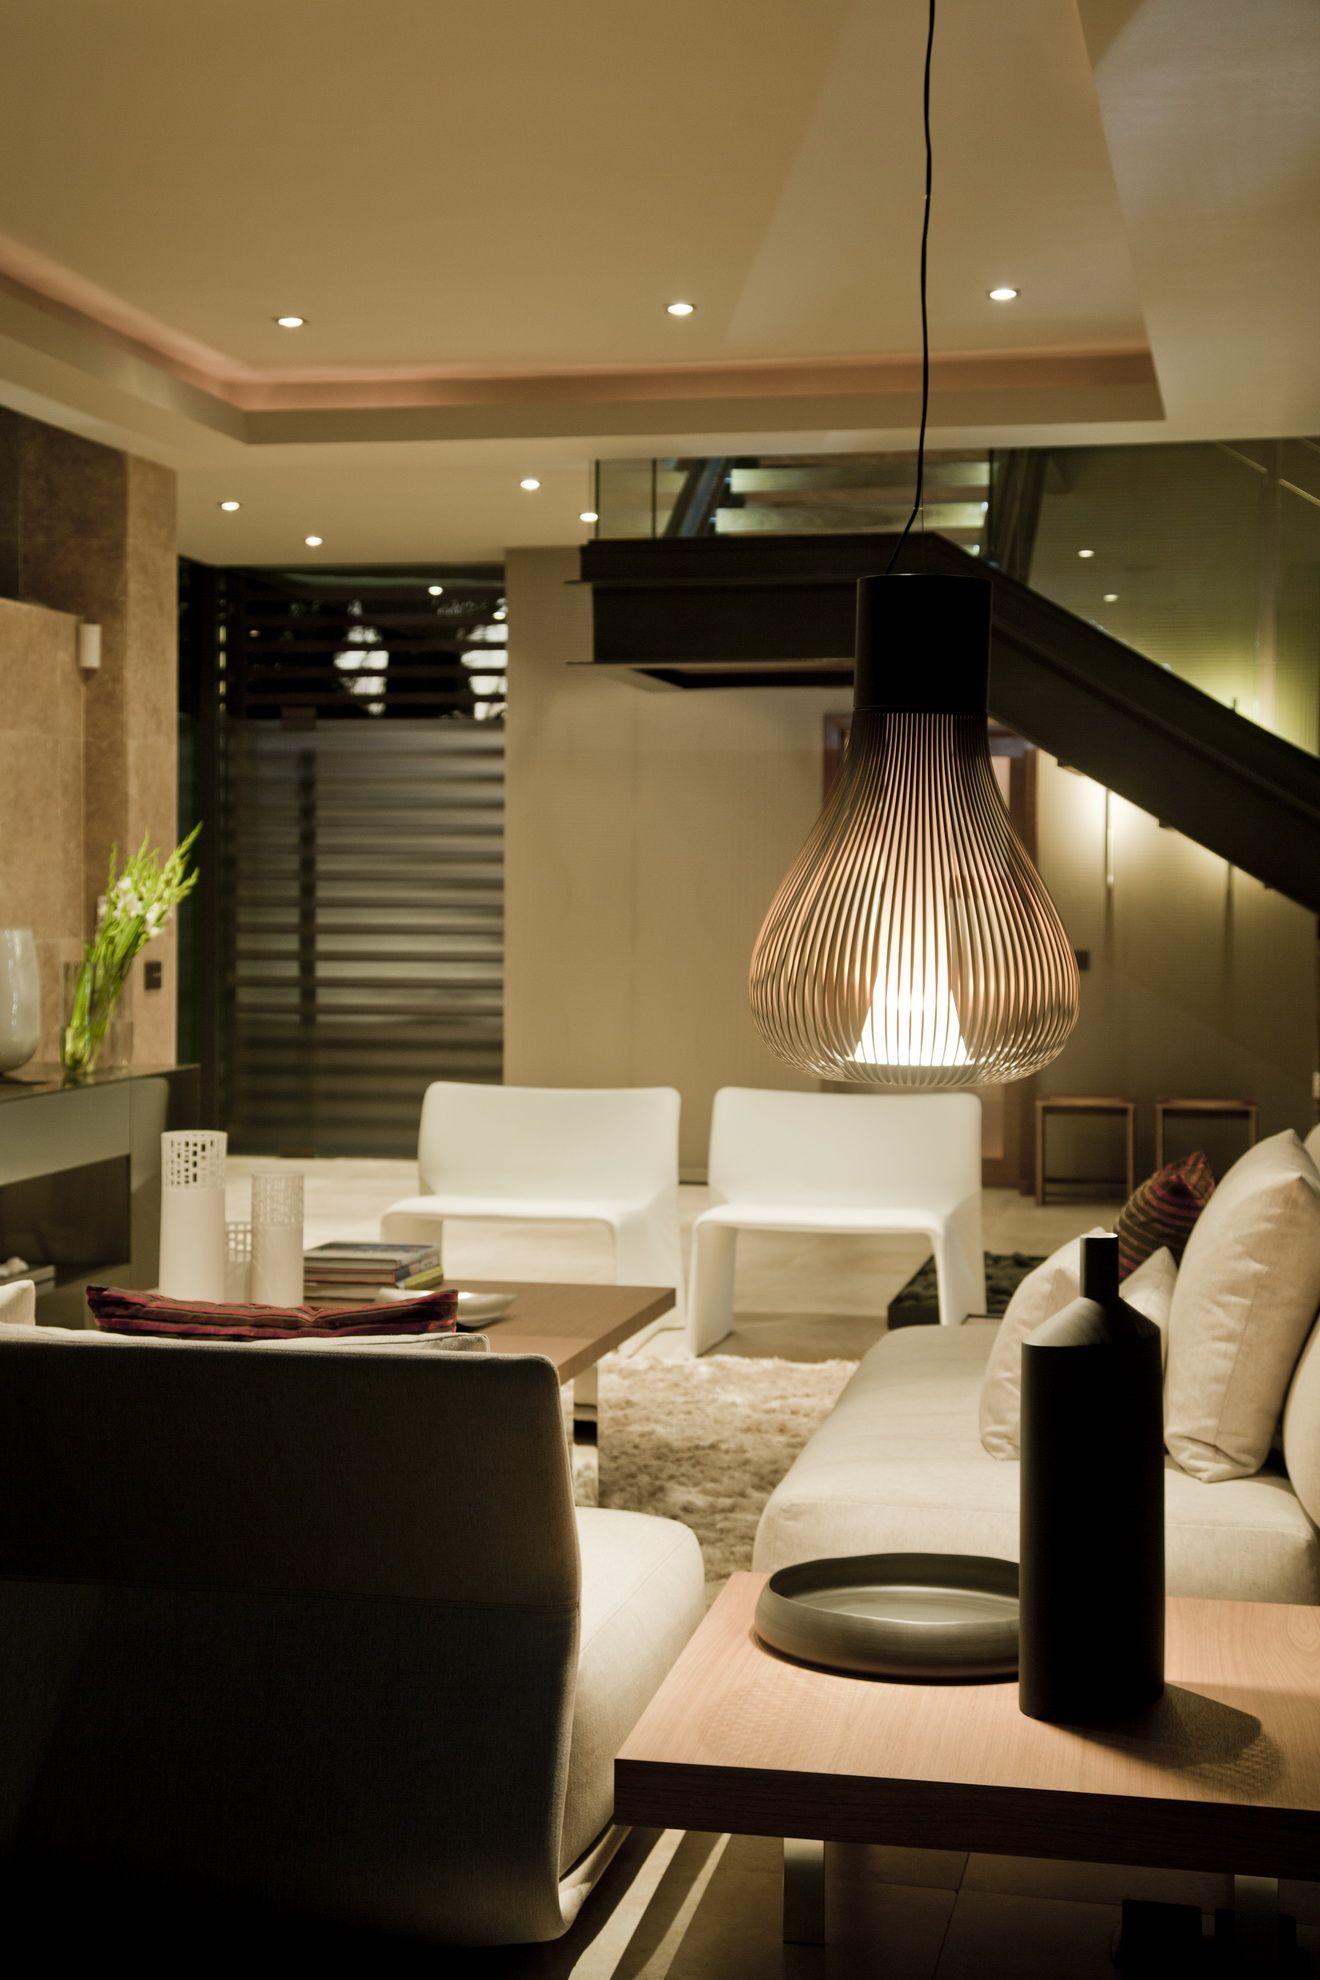 house abo living area m square lifestyle design m square lifestyle a r c h i t e c t u. Black Bedroom Furniture Sets. Home Design Ideas